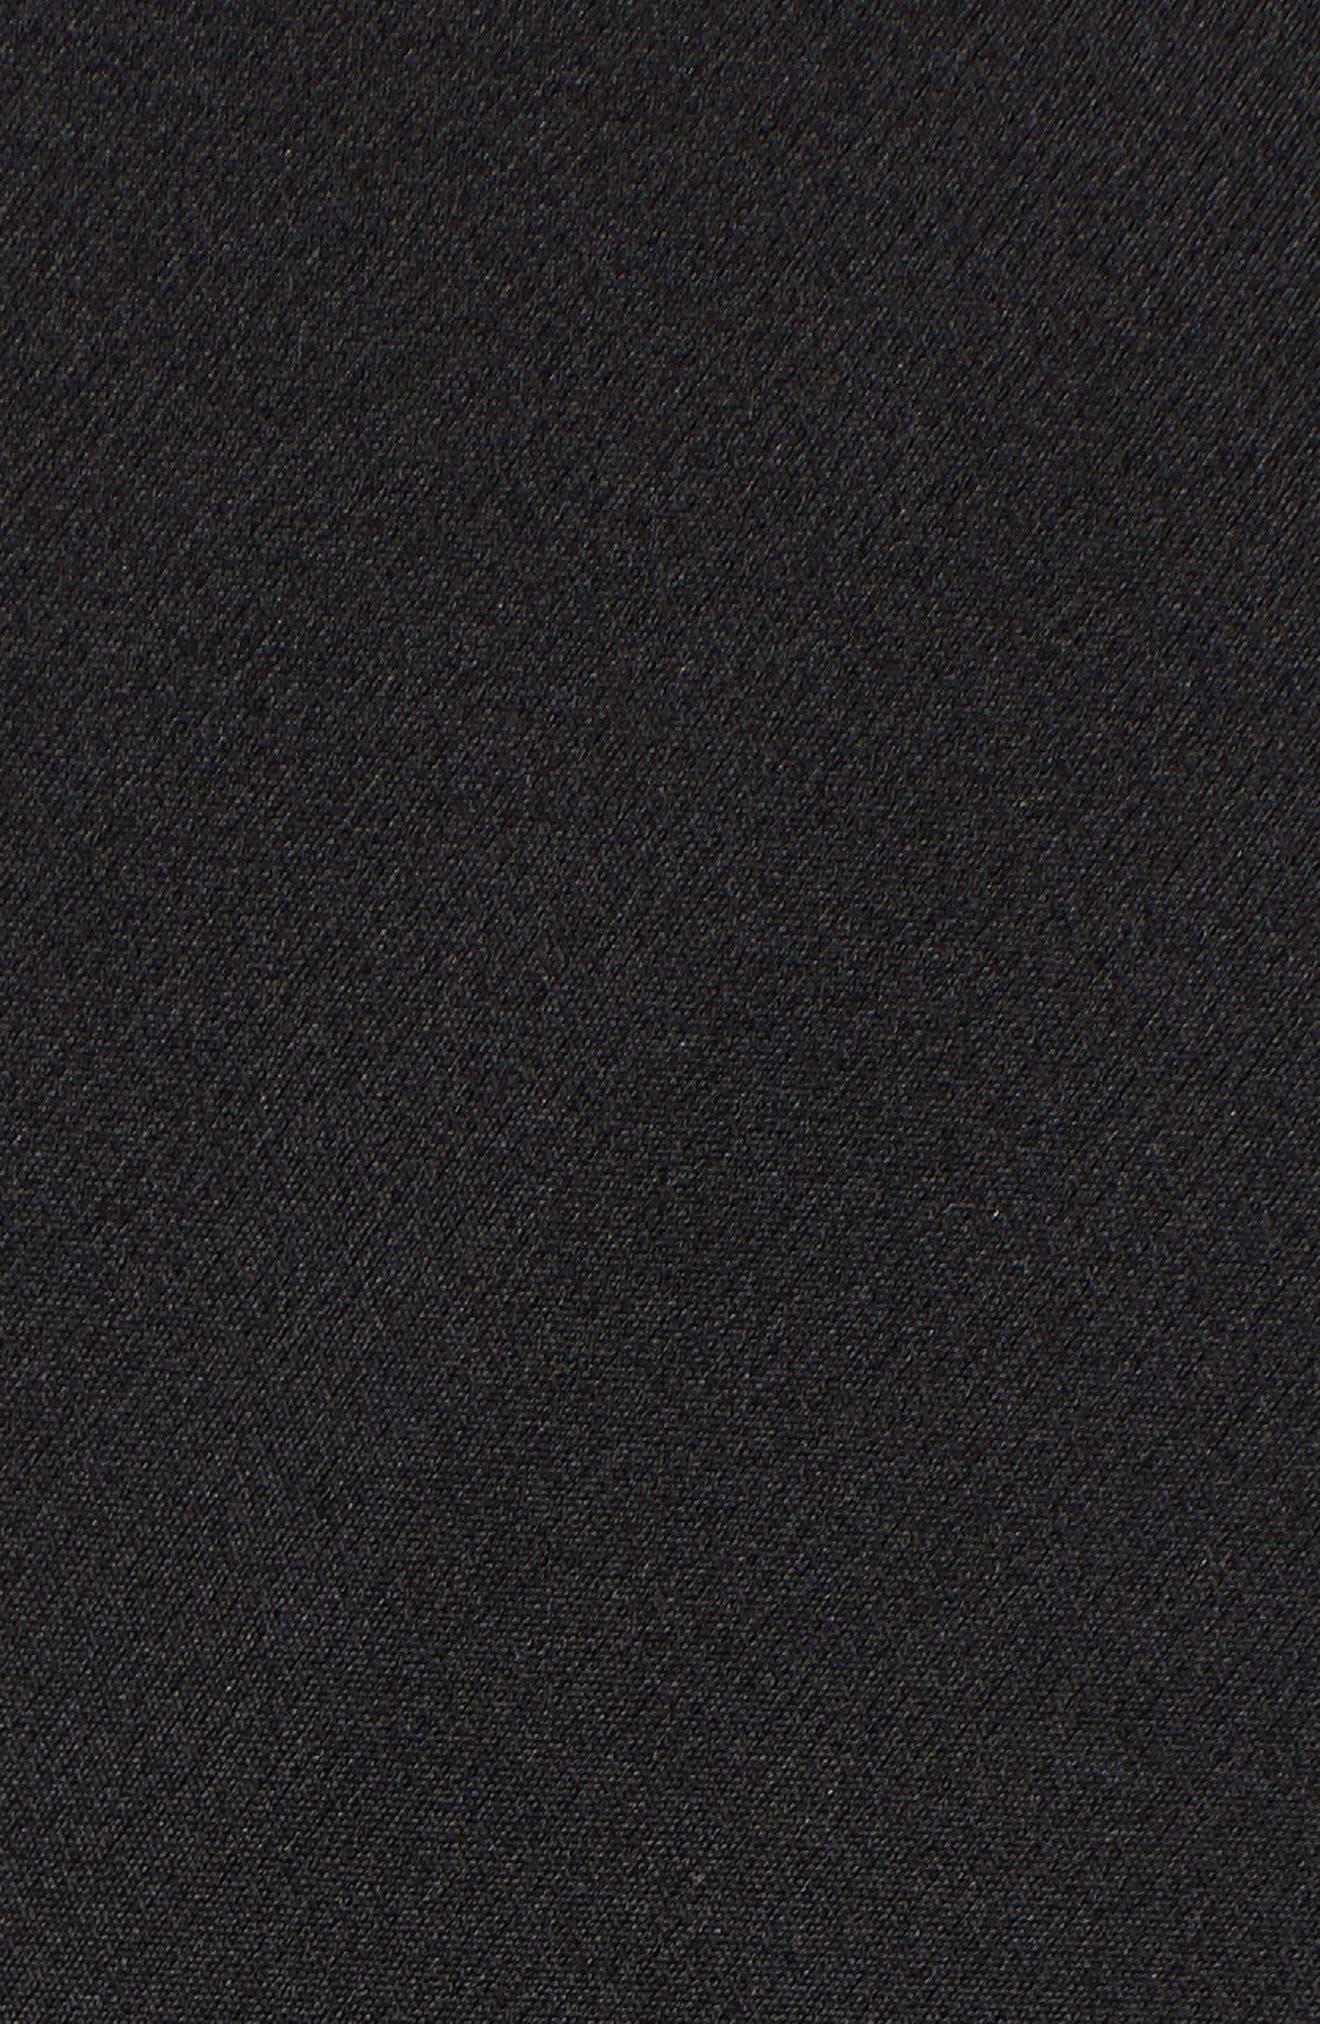 Popover Strapless Jumpsuit,                             Alternate thumbnail 5, color,                             Black